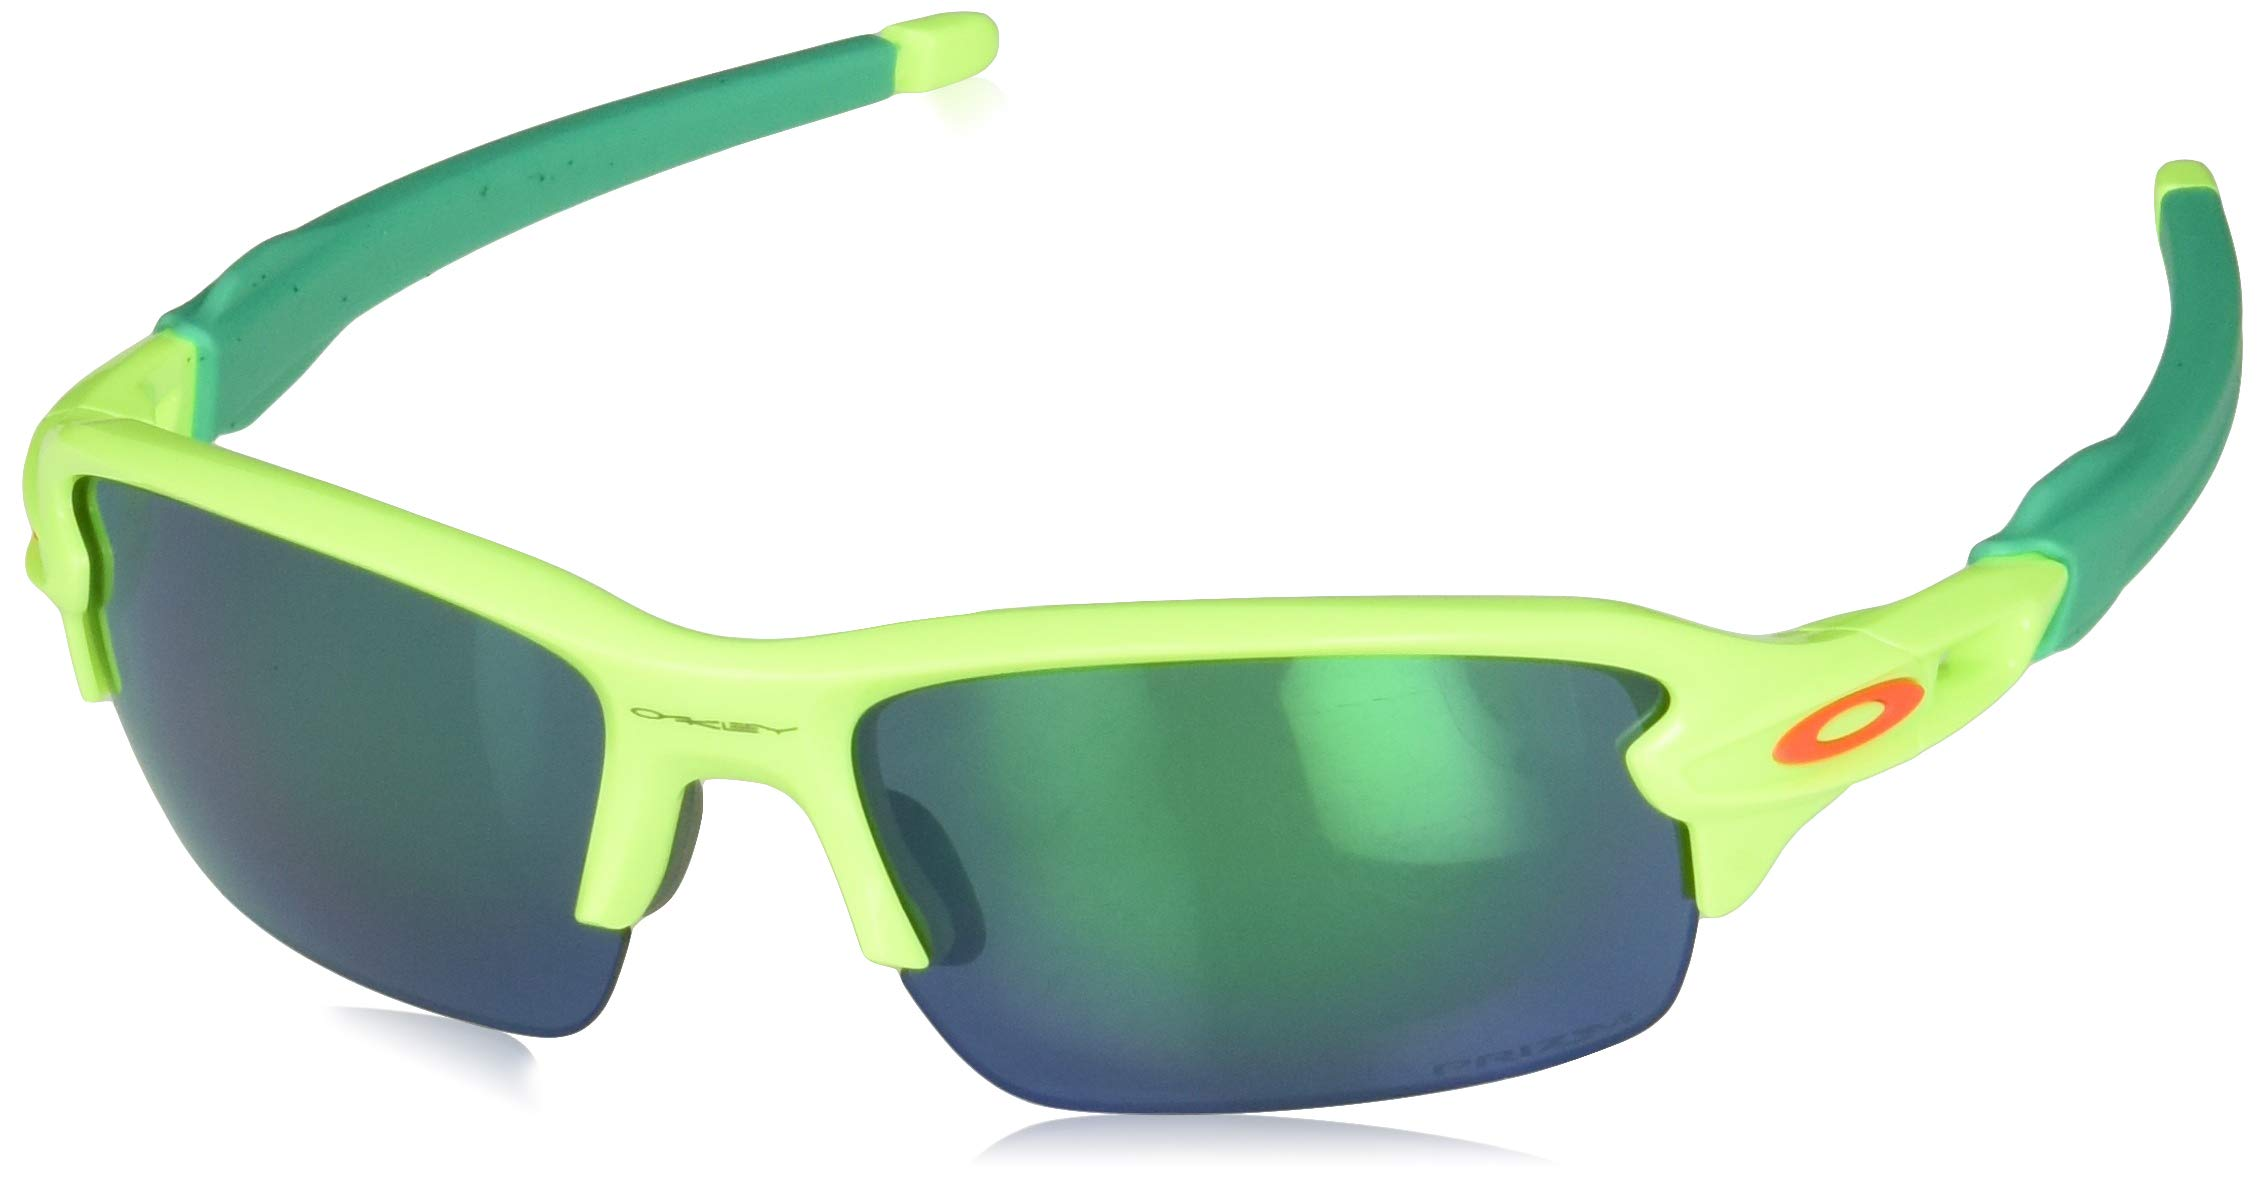 Oakley Youth Boys OJ9005 Flak XS Rectangular Sunglasses, Retina Burn/Prizm Jade, 59 mm